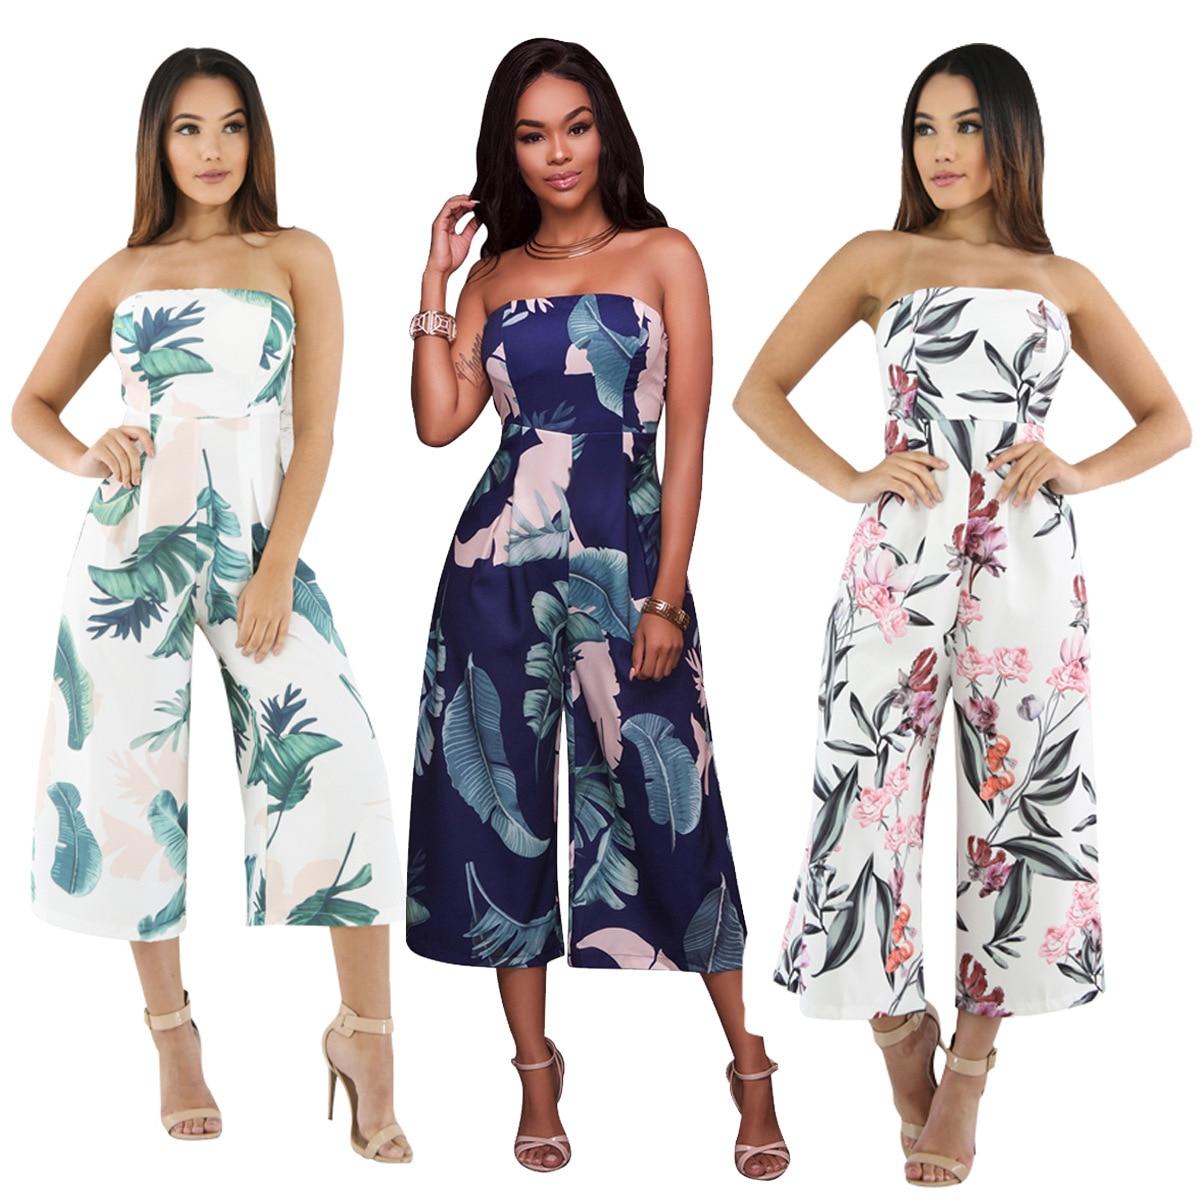 Playsuits Rompers For Women 2018 banana leaf Jumpsuit Plus Size Women Bodysuits Elegant Bodies Mujer Macacao Feminino Pantalon